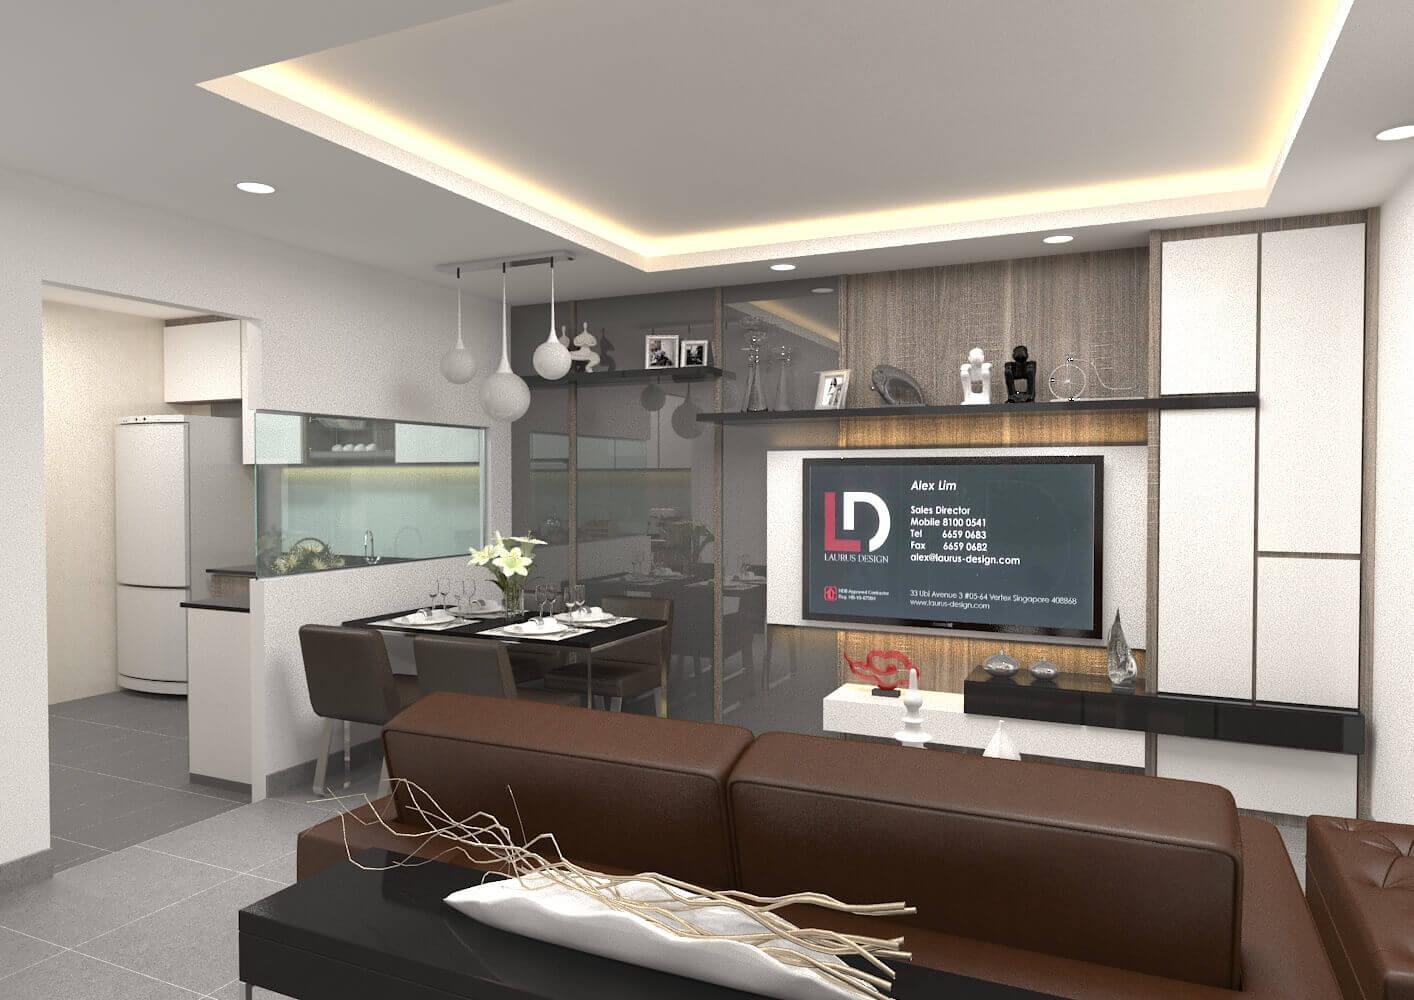 4 Room Hdb Laurus Design Pte Ltd